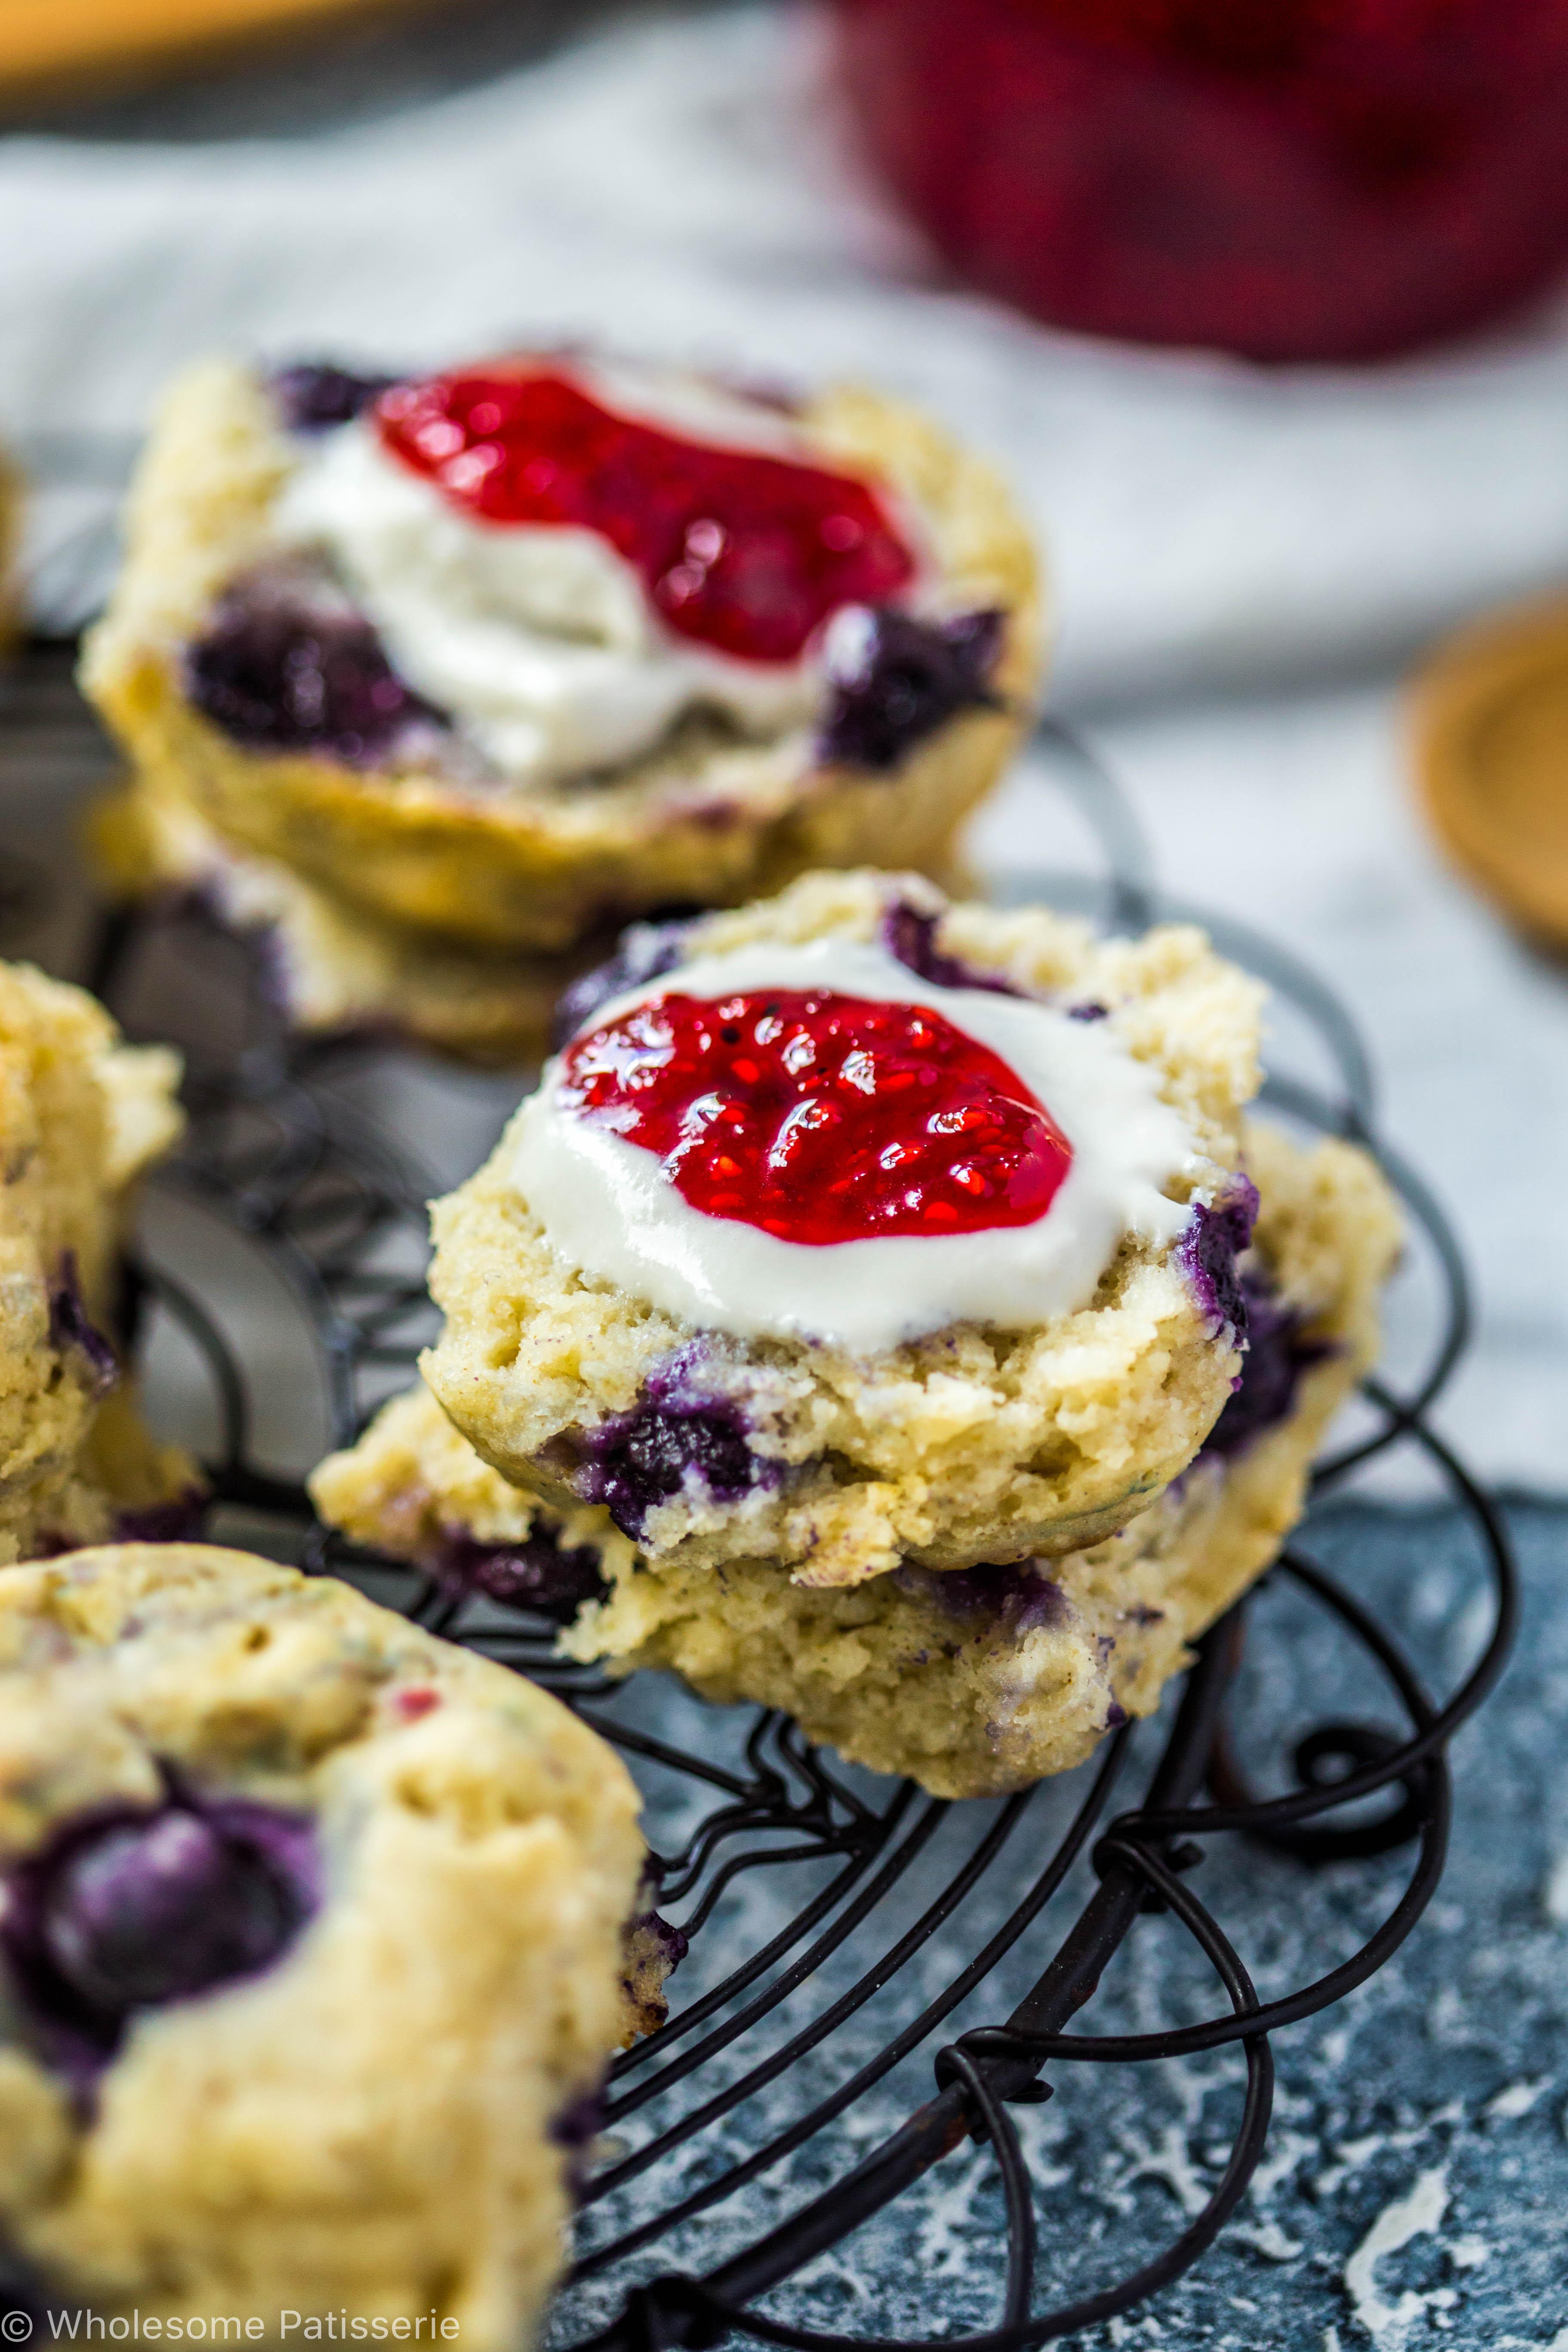 Dairy Free Soy Free Desserts  Blueberry Scones Vegan Gluten Free Wolesome Patisserie